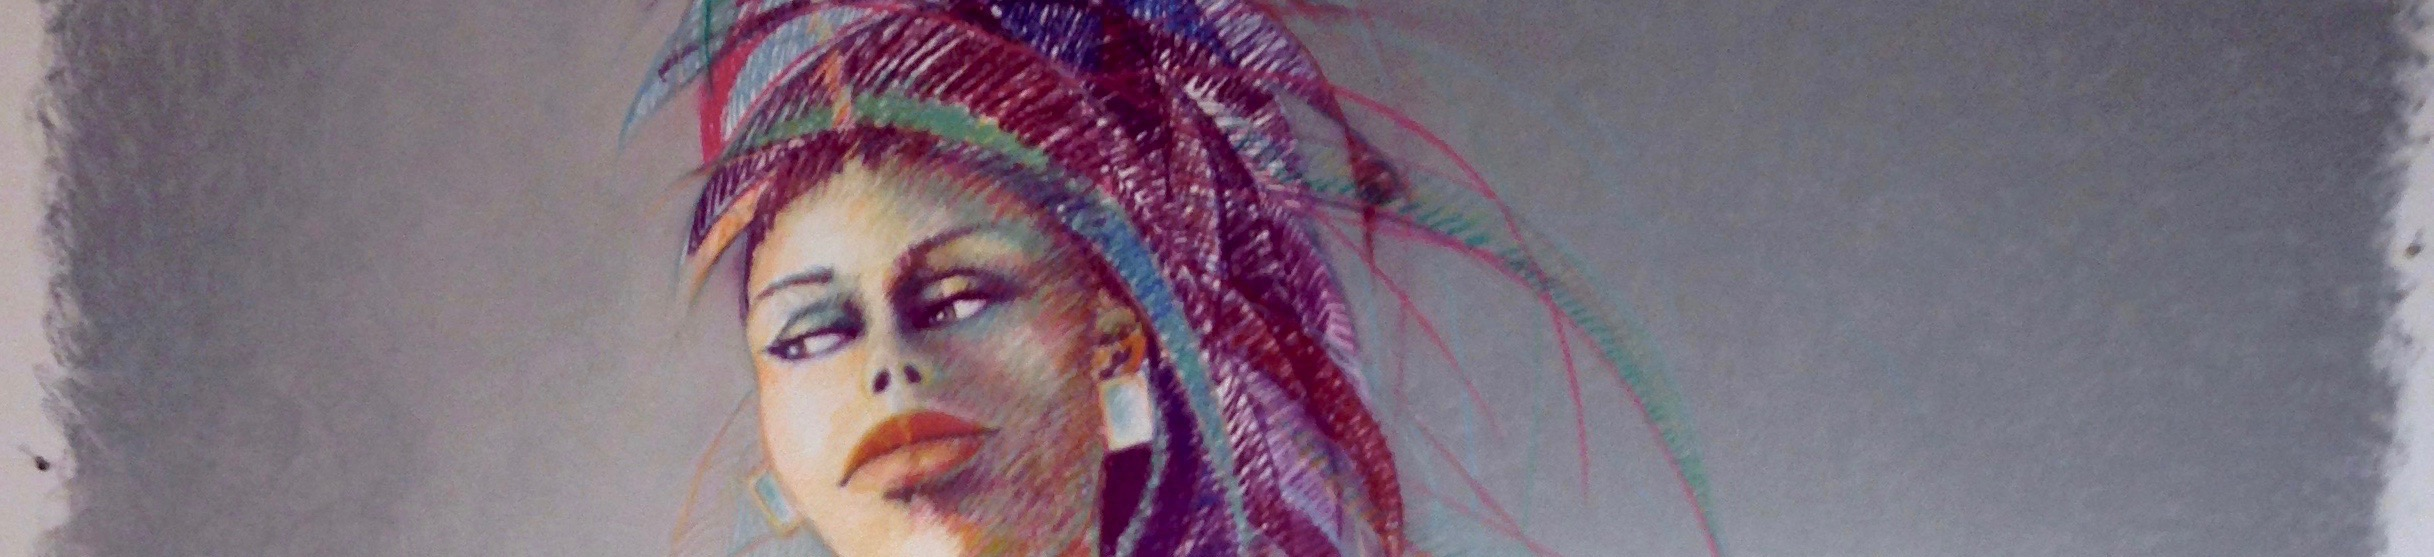 """Alma Pausing"" drawing detail, lorraine garcía-nakata, 2015"